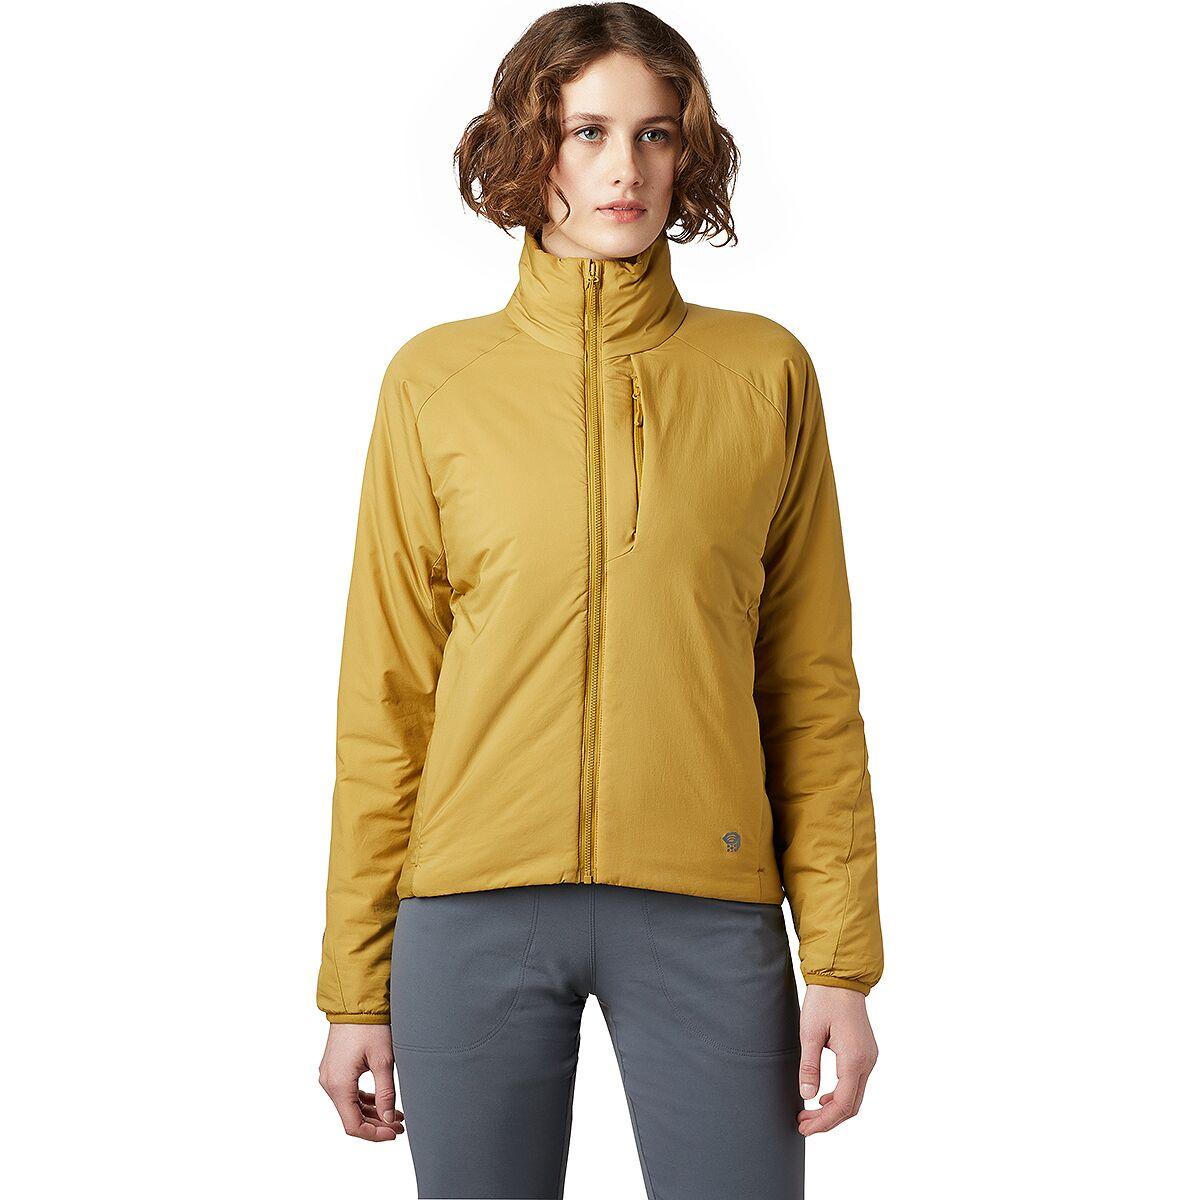 Kor Strata Jacket - Women